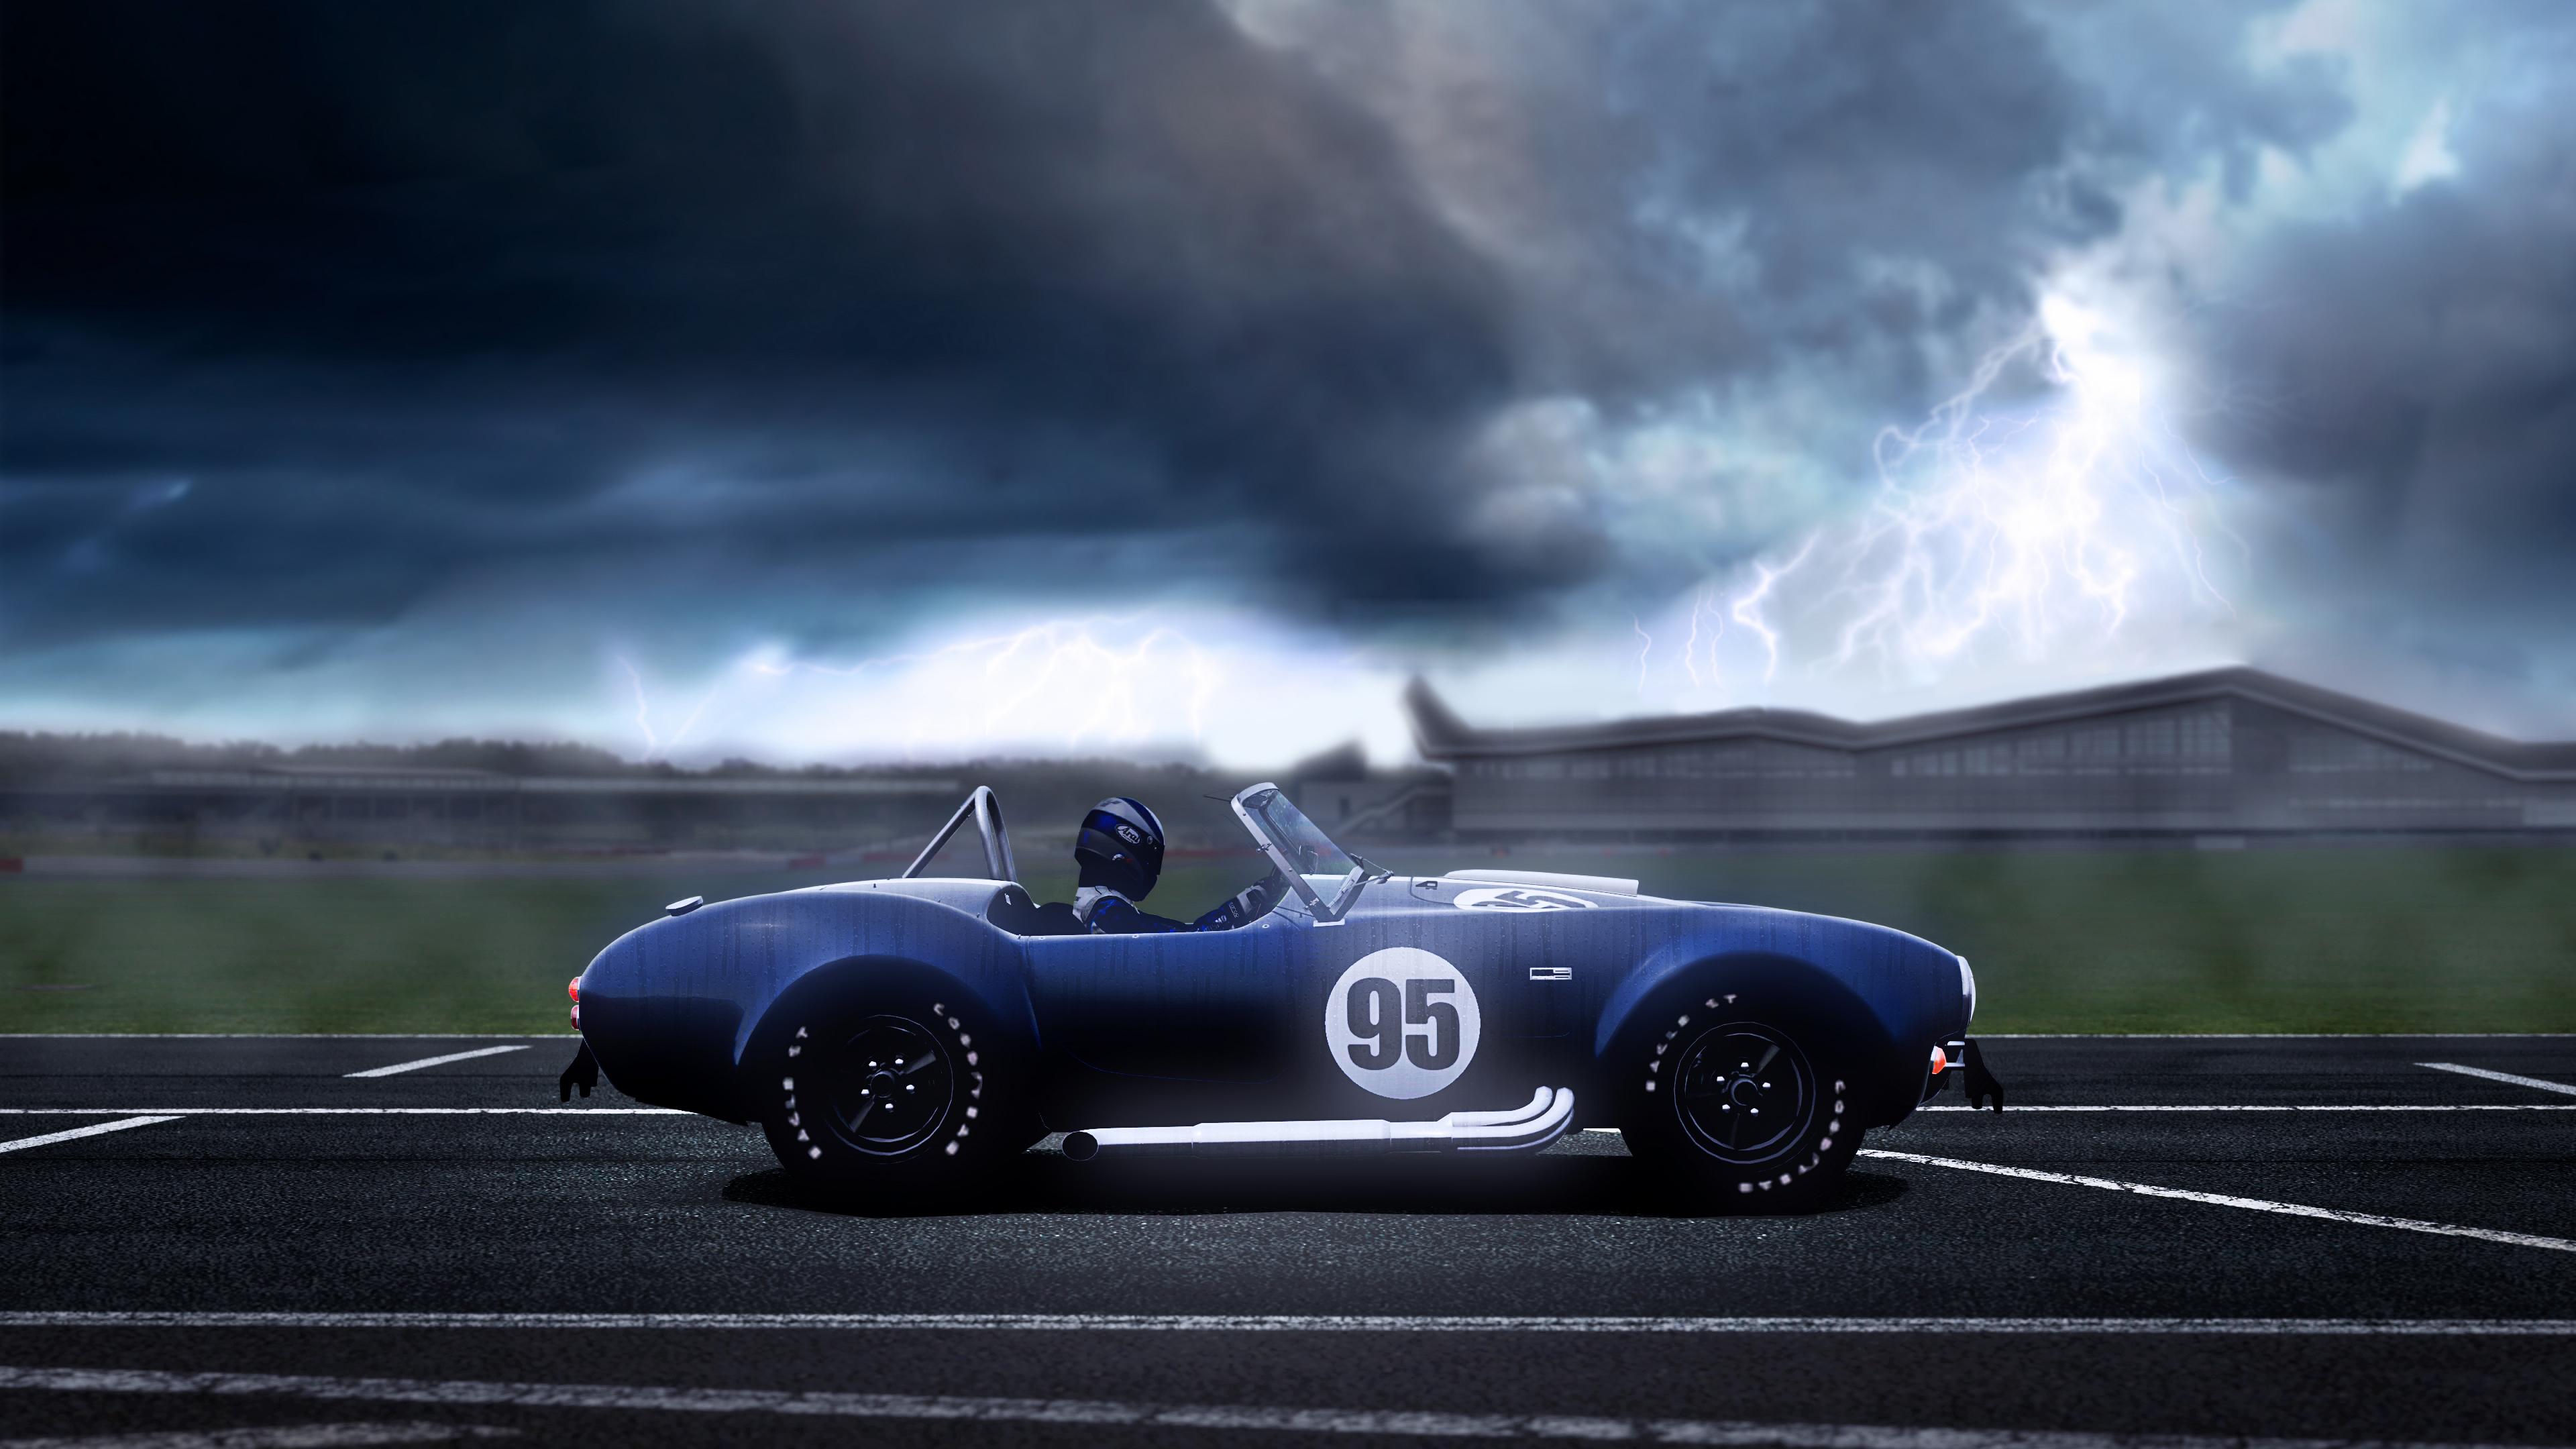 Wallpaper Vehicle Clouds Storm Sports Car Classic Car